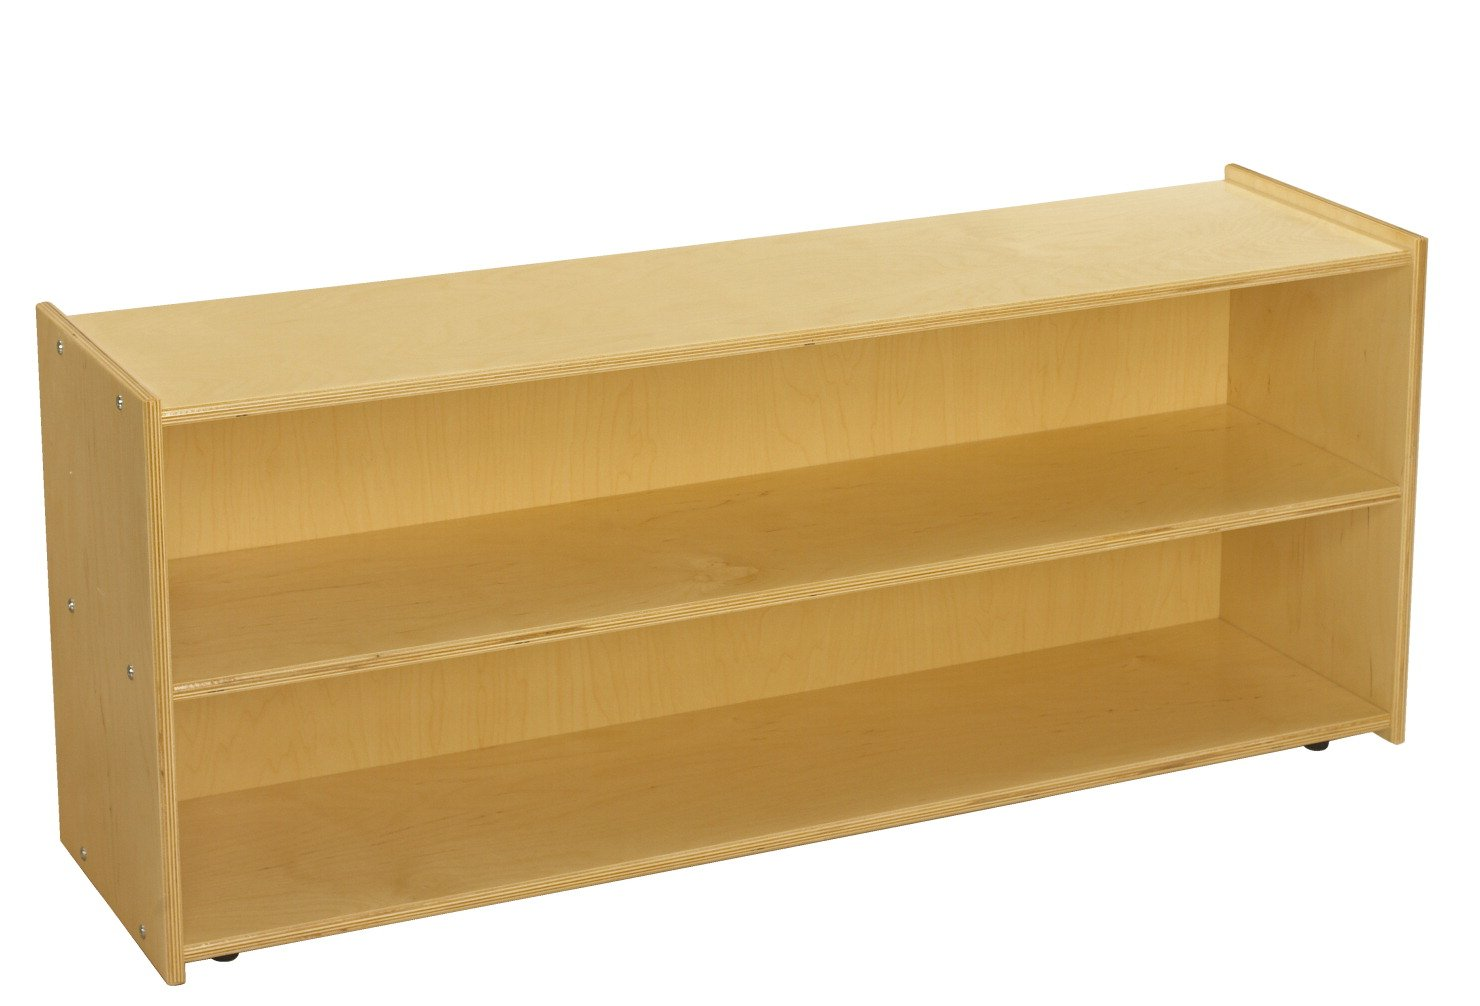 Childcraft ABC Furnishings 2-Shelf Storage Unit, 48 W x 13 D x 20 H in